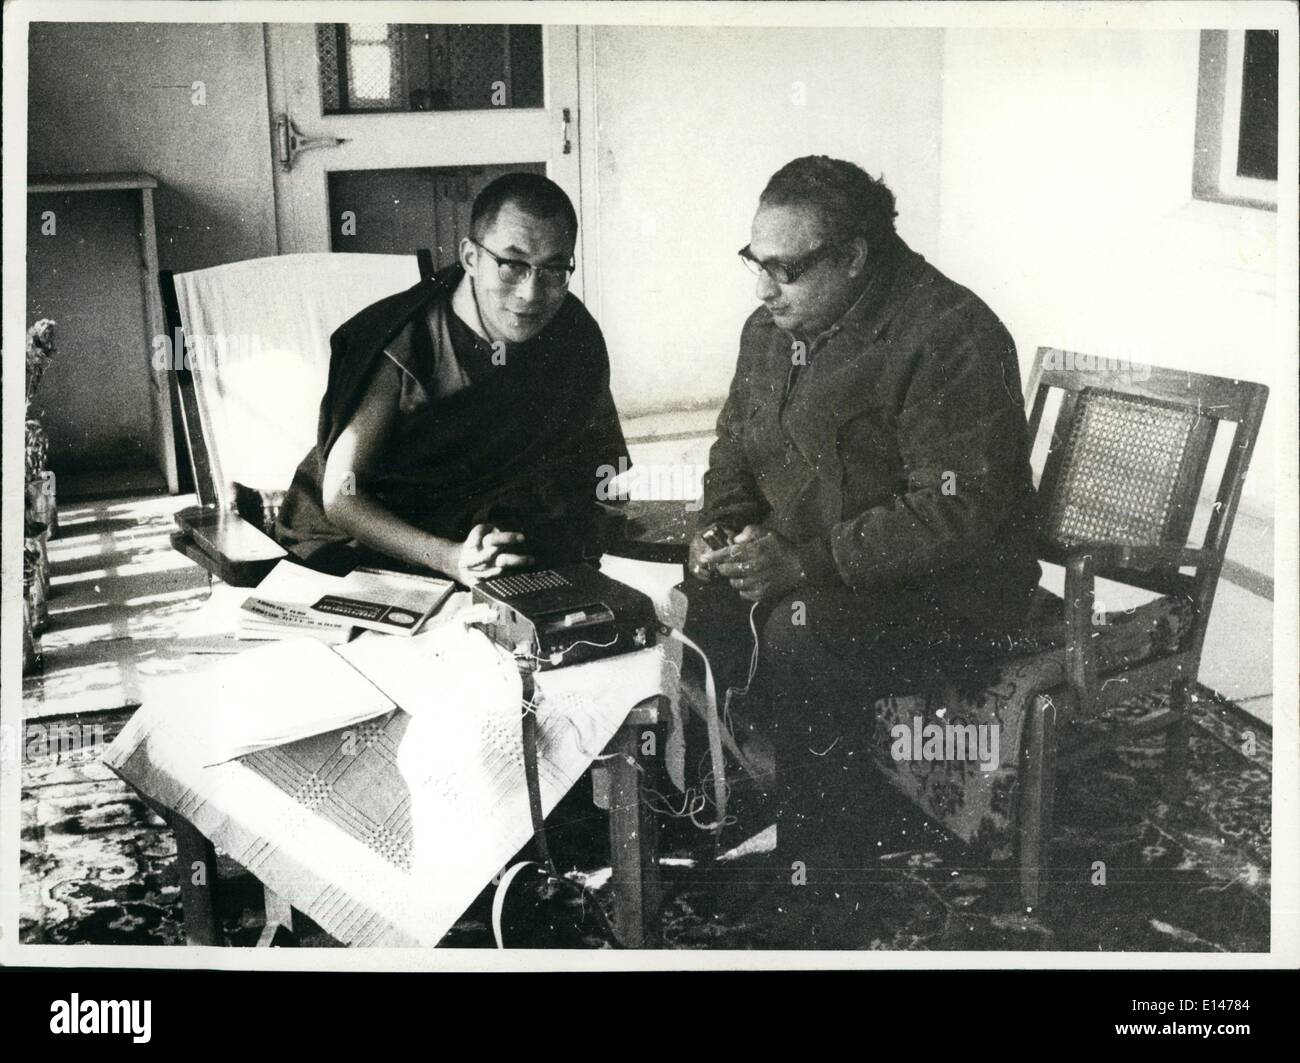 Apr. 16, 2012 - Tenzin Gyatso the present Dalai Lama XIV (birth 1933) extreme left, is being interviewed Dharmashala by Dr. H.N.Banerjee, Director Department of Parapsychology, University of Rajasthan, Jaipur. - Stock Image